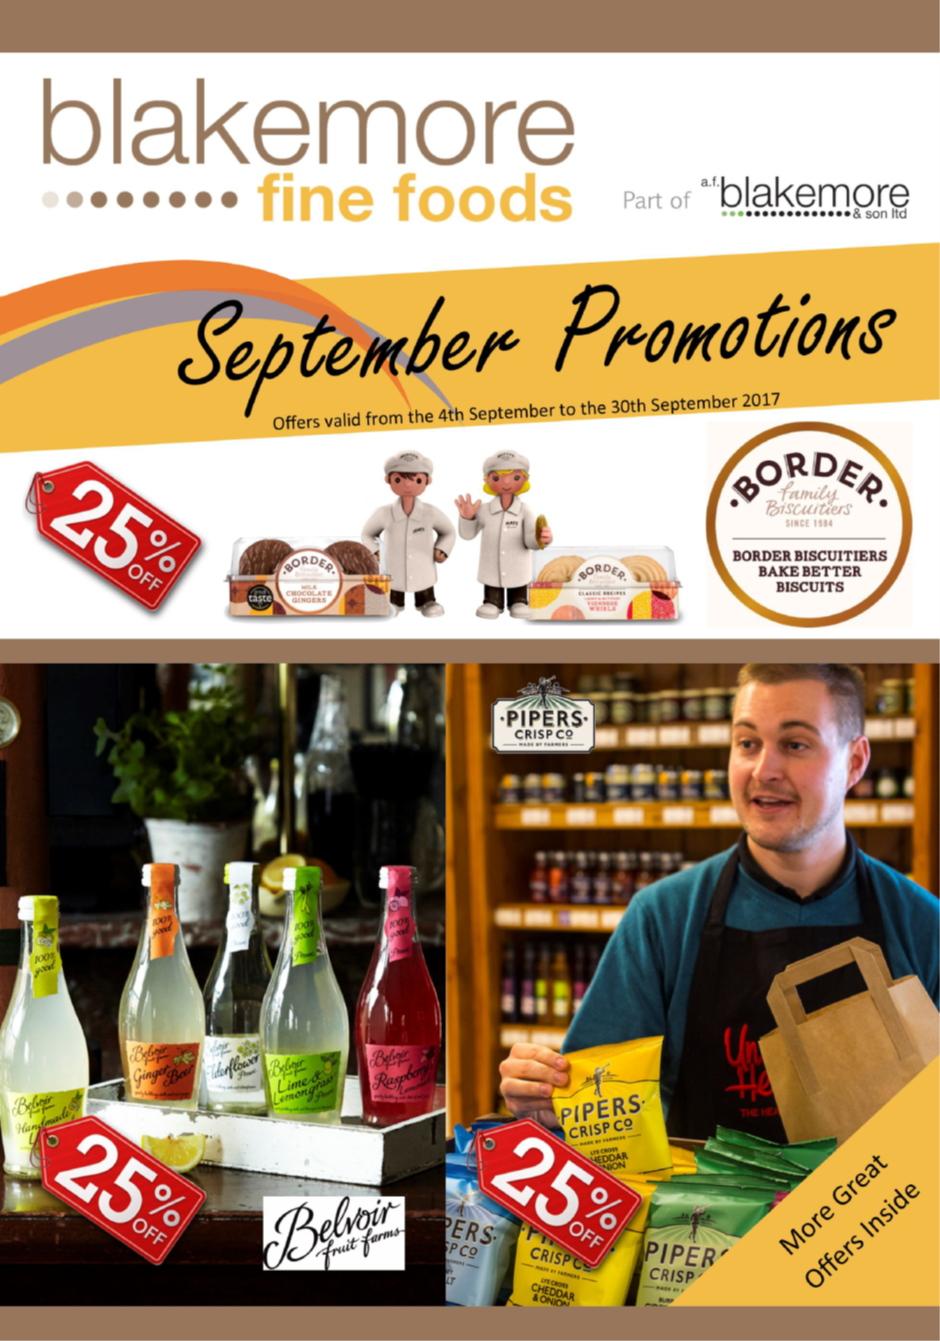 Blakemore_Fine_Foods_Promotions_September_2017